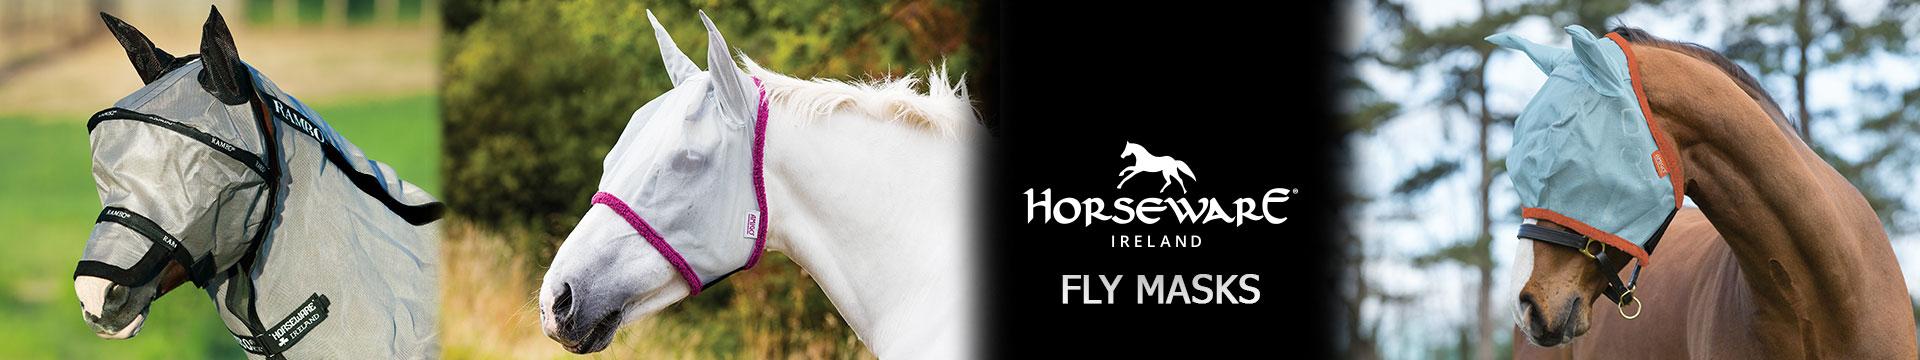 Horseware Fly Masks